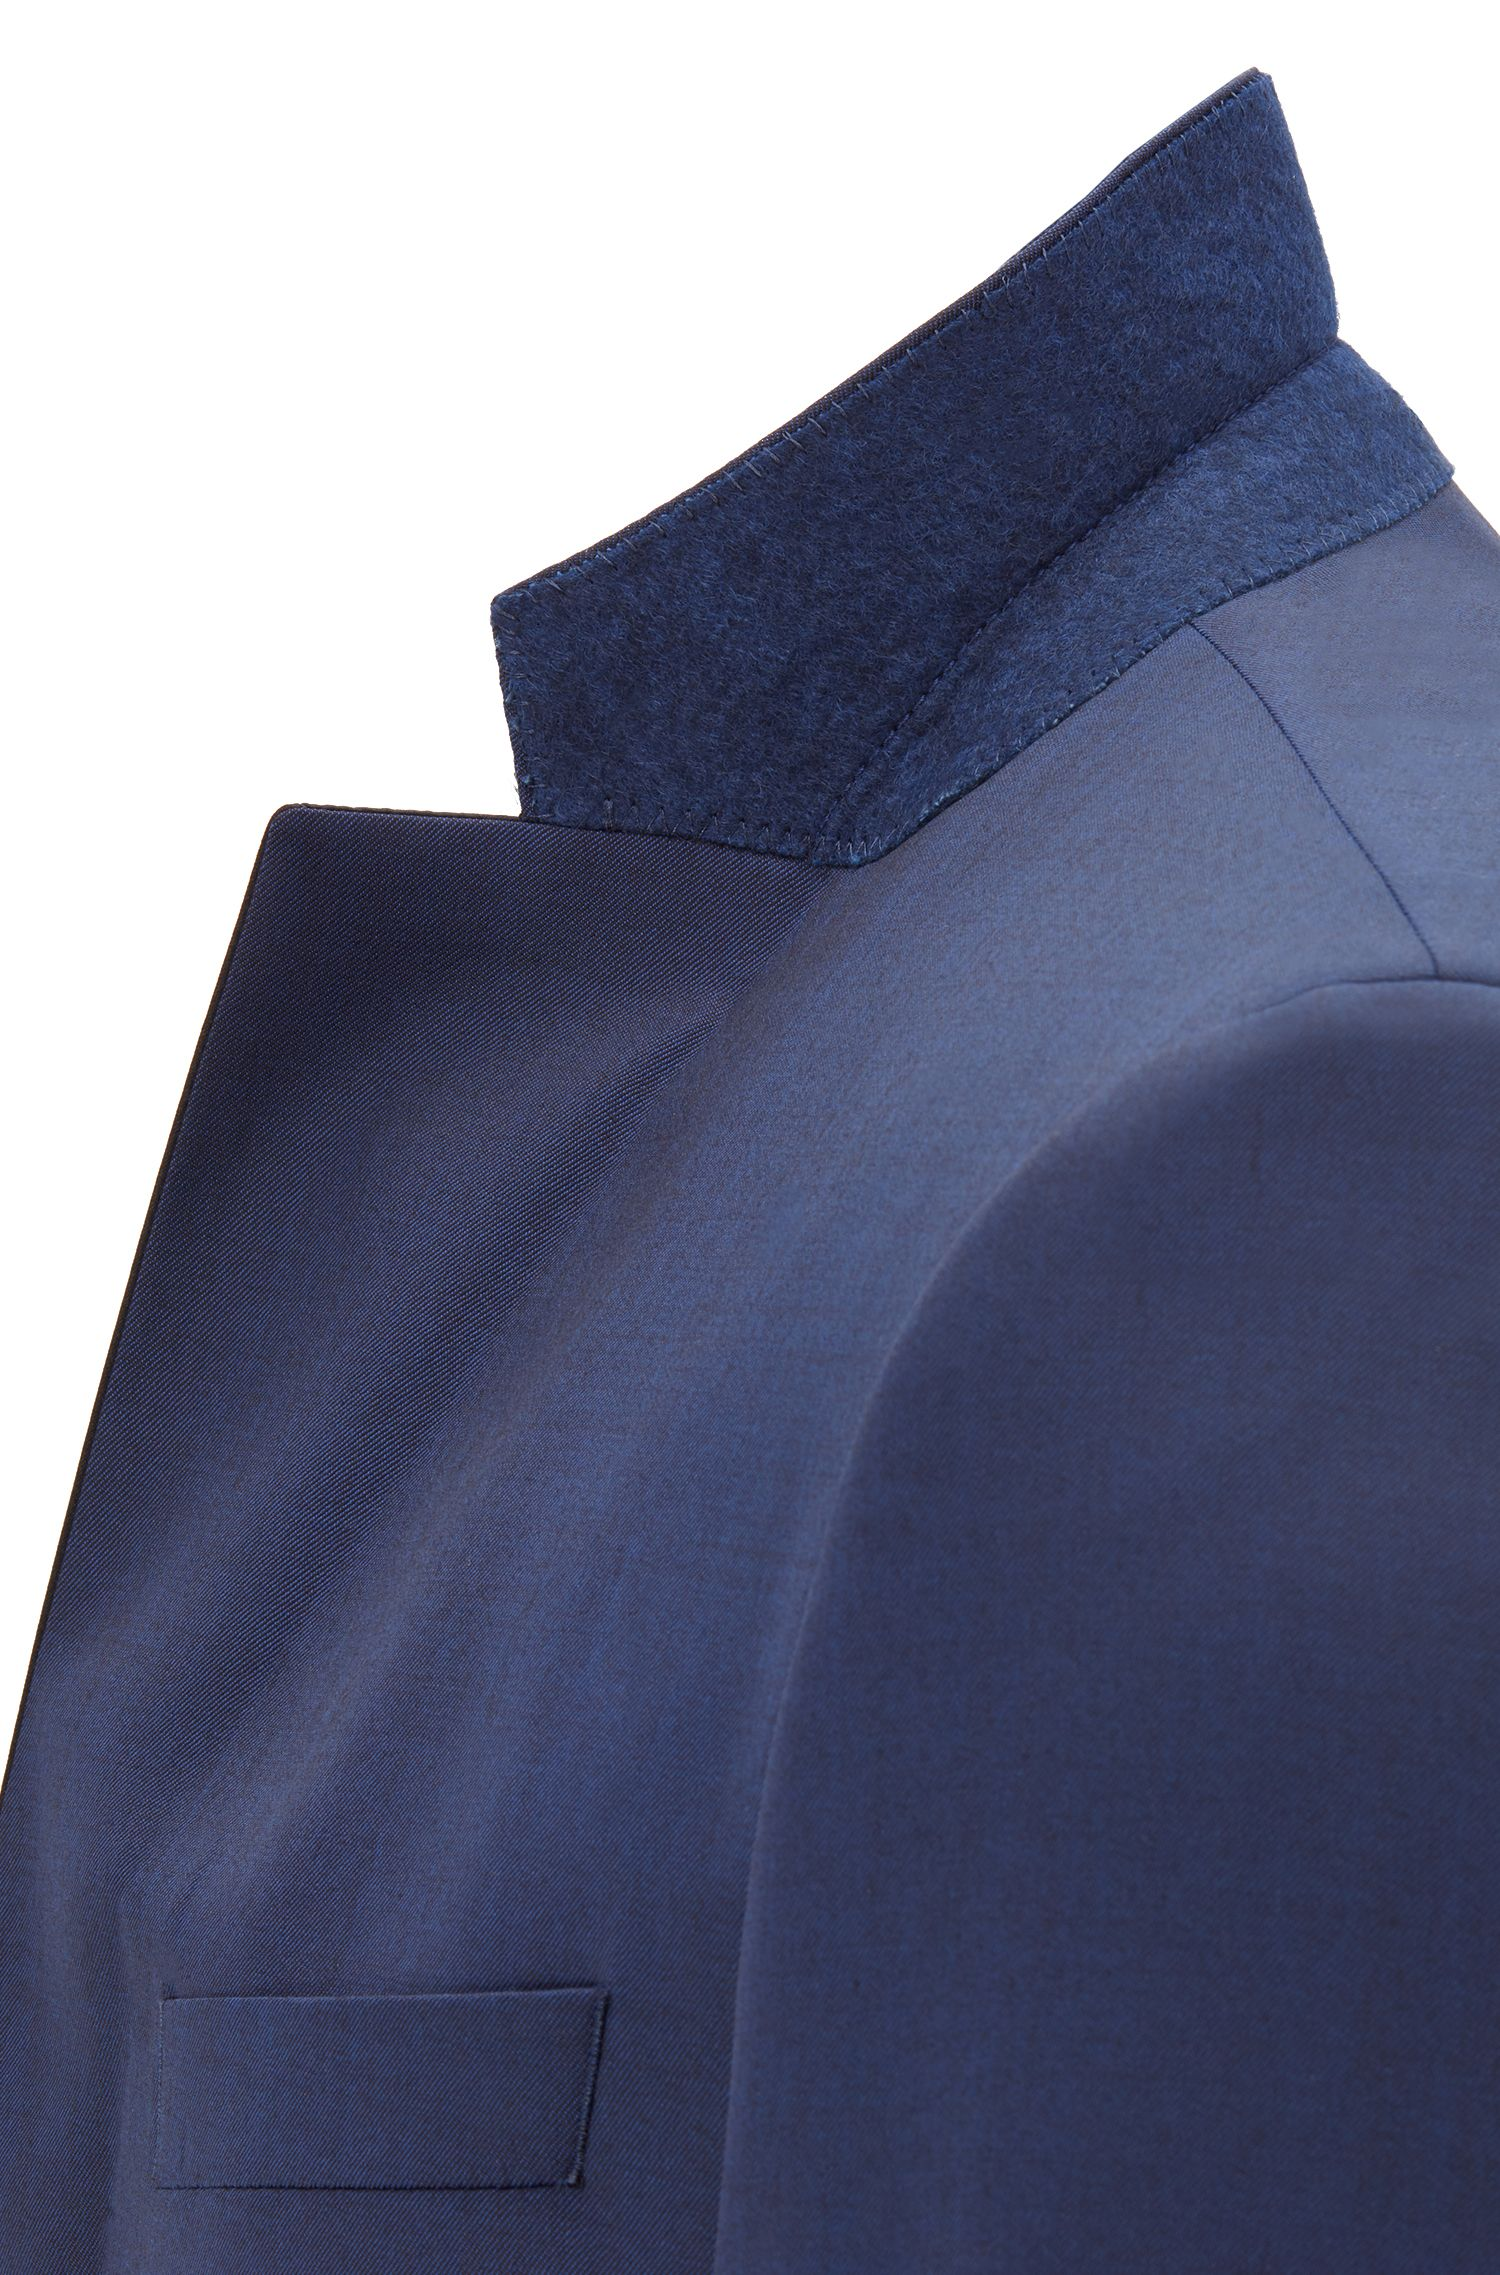 Slim-fit tuxedo in virgin wool with silk trims, Dark Blue